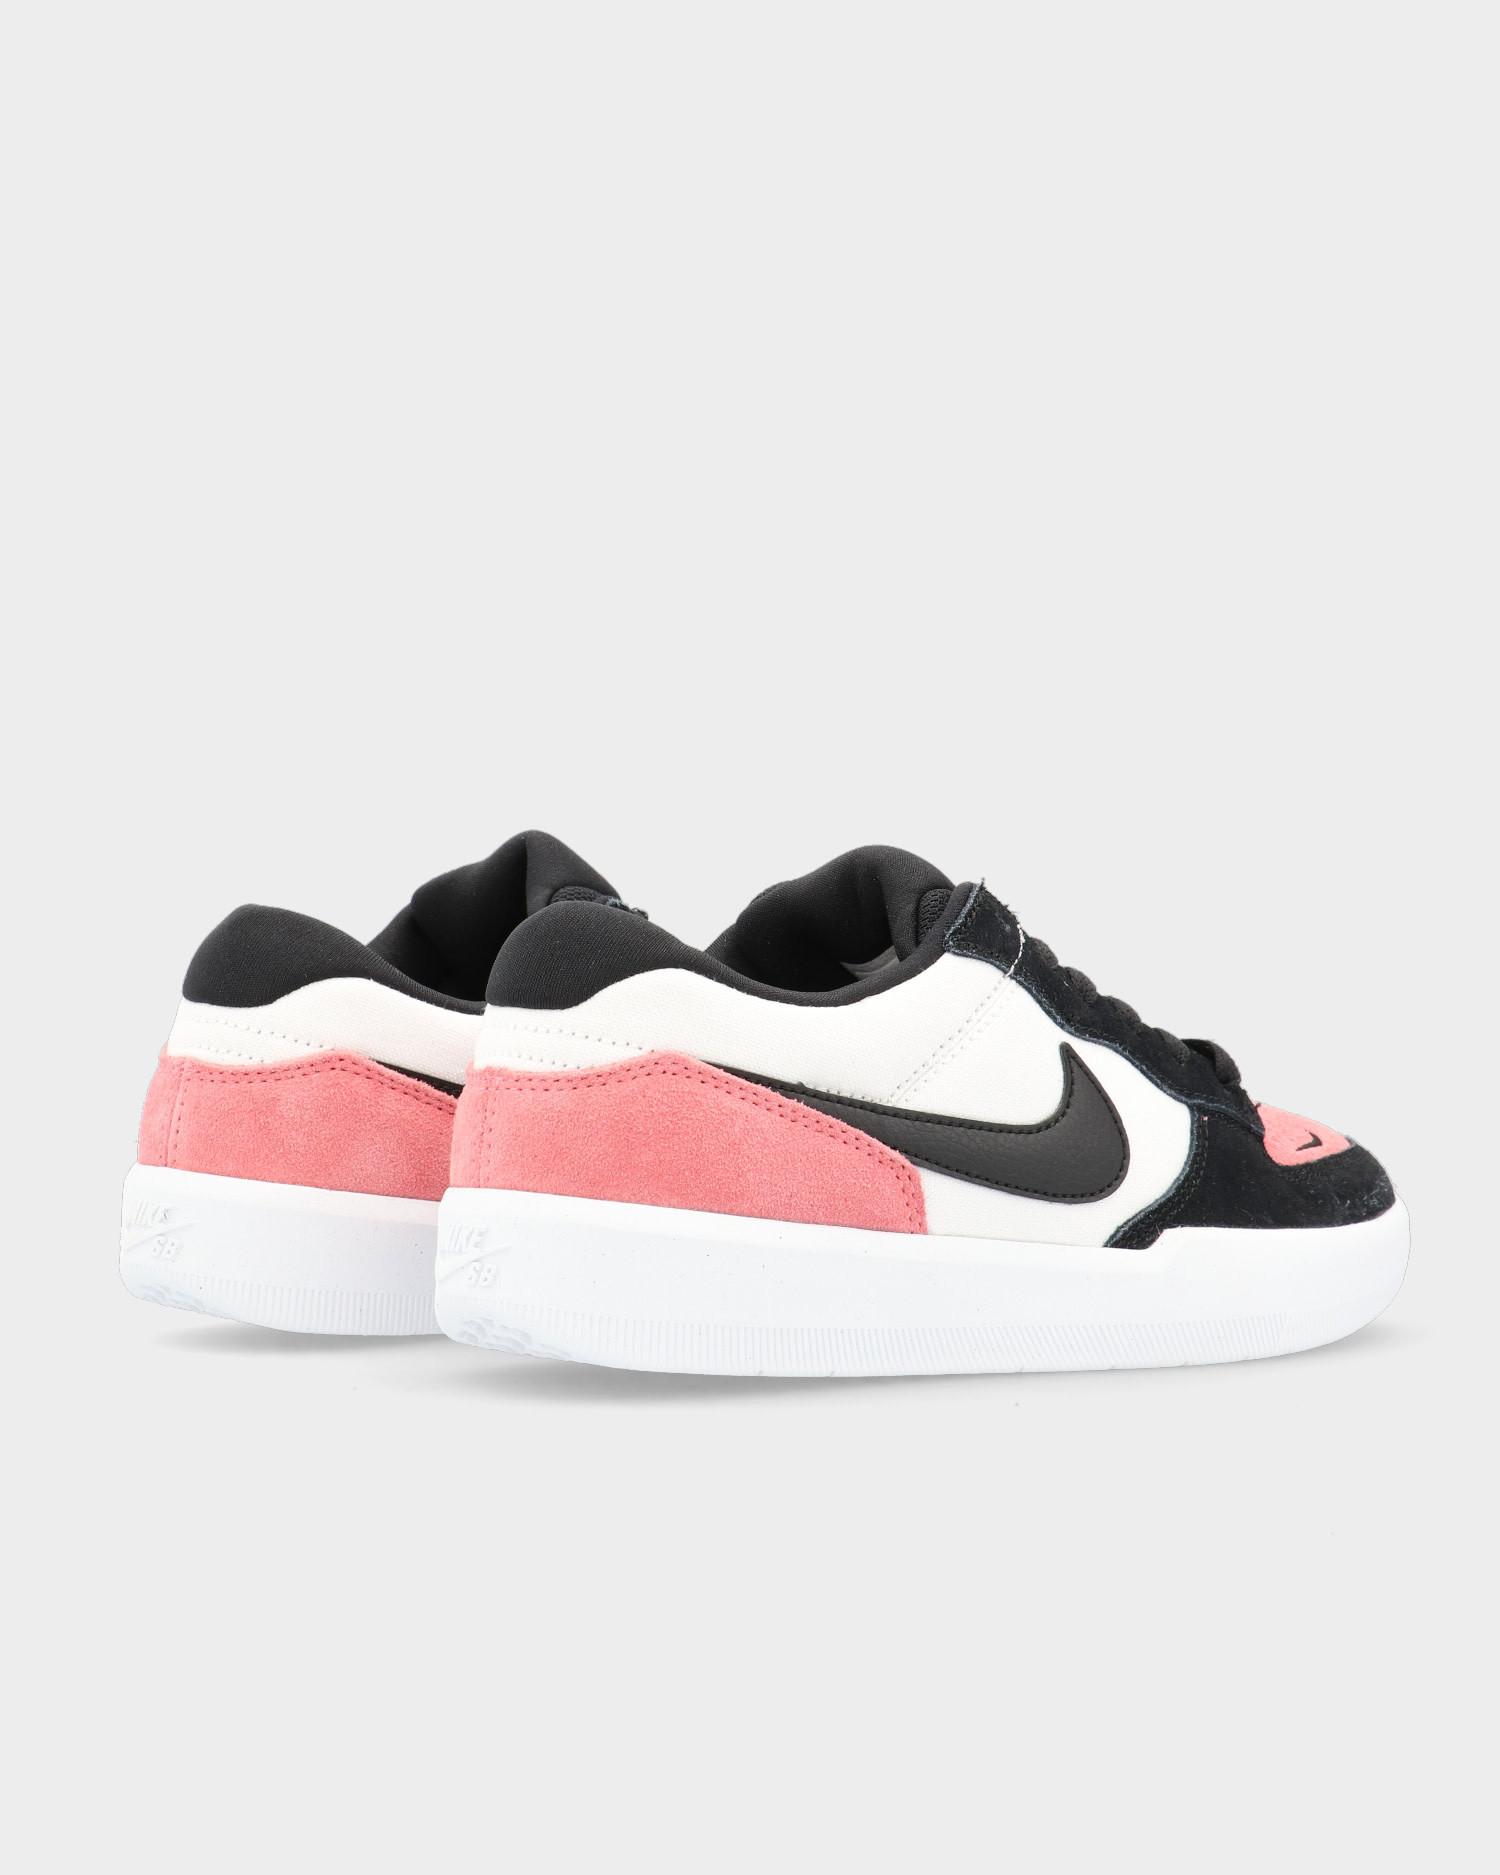 Nike SB Force 58 Pink Sail/Black